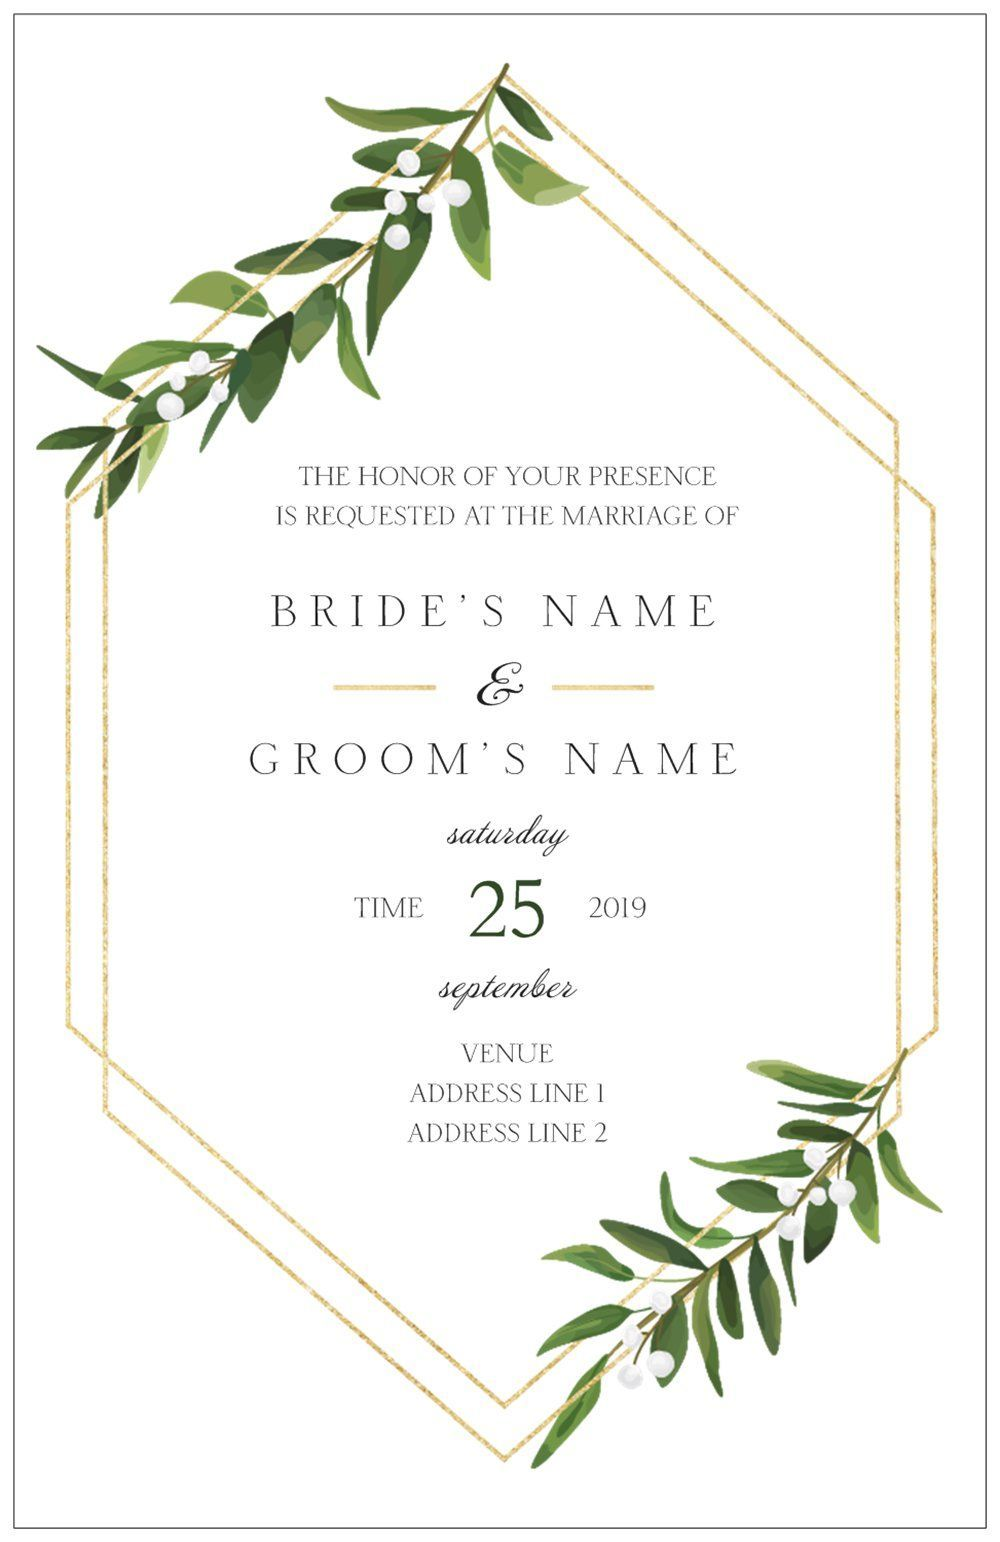 Custom Wedding Invitations Announcements Vistaprint Custom Wedding Invitations Beach Wedding Invitations Wedding Invitations